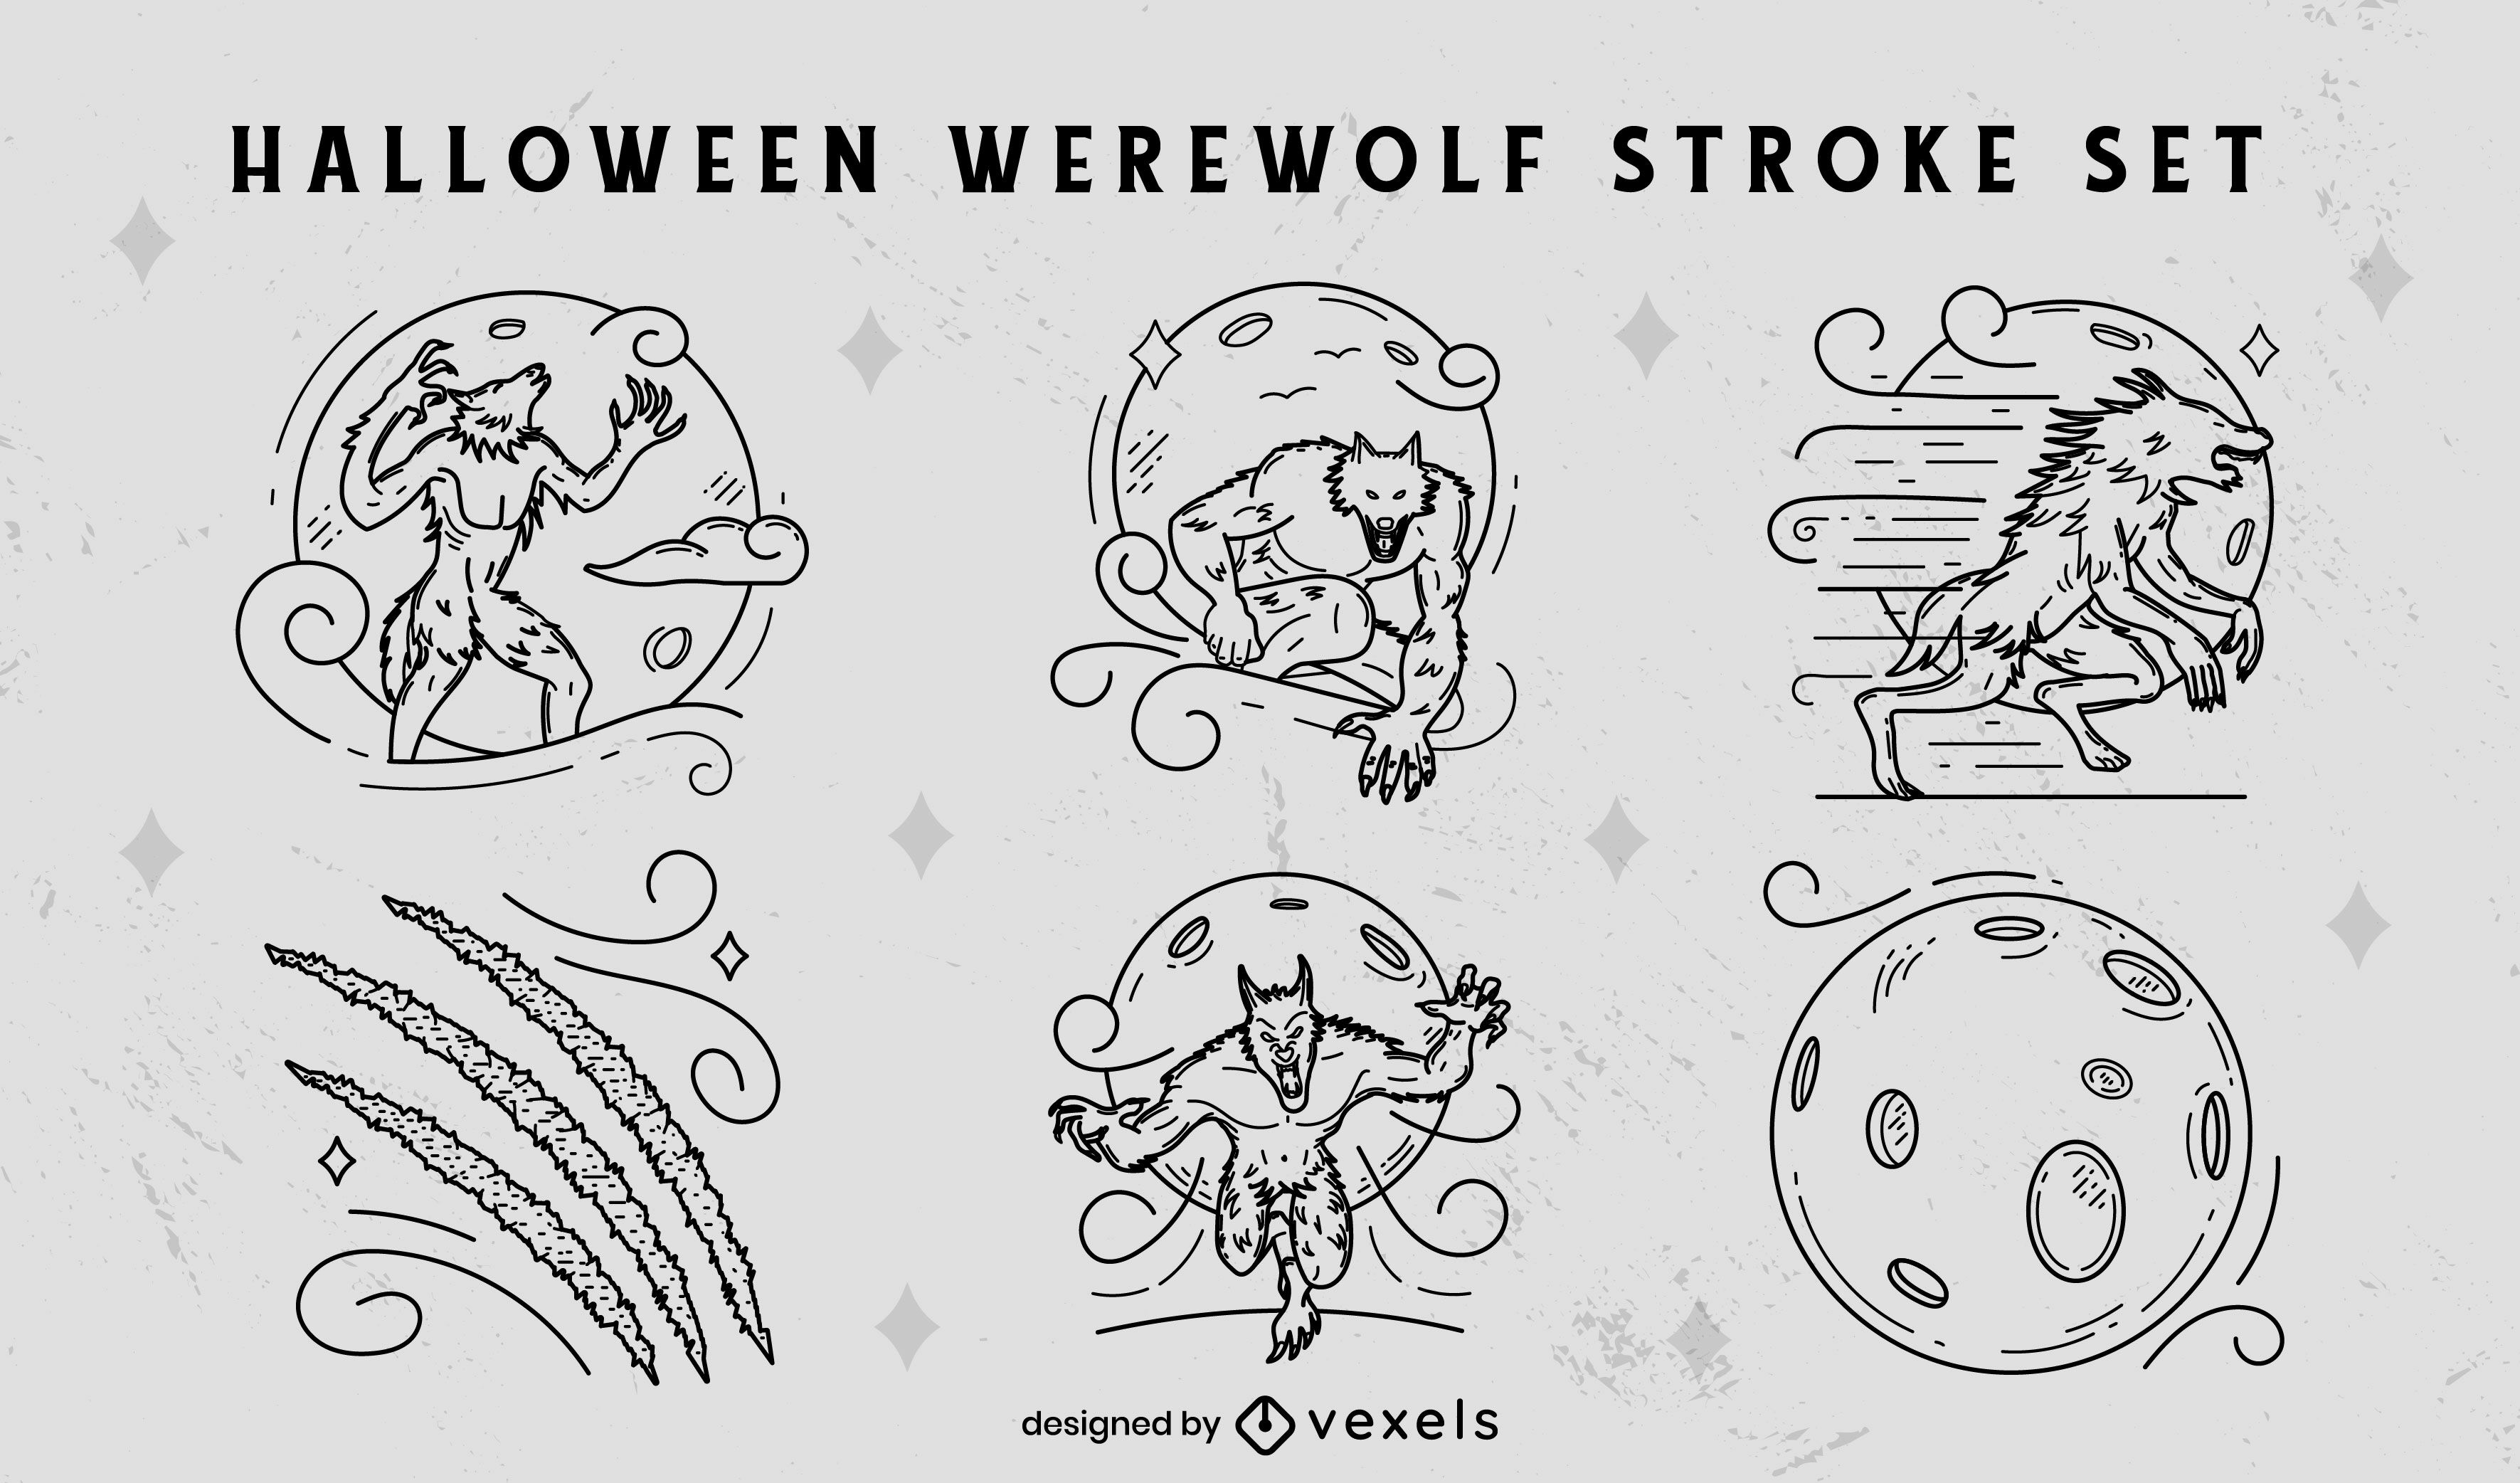 Werewolf supernatural monster stroke set